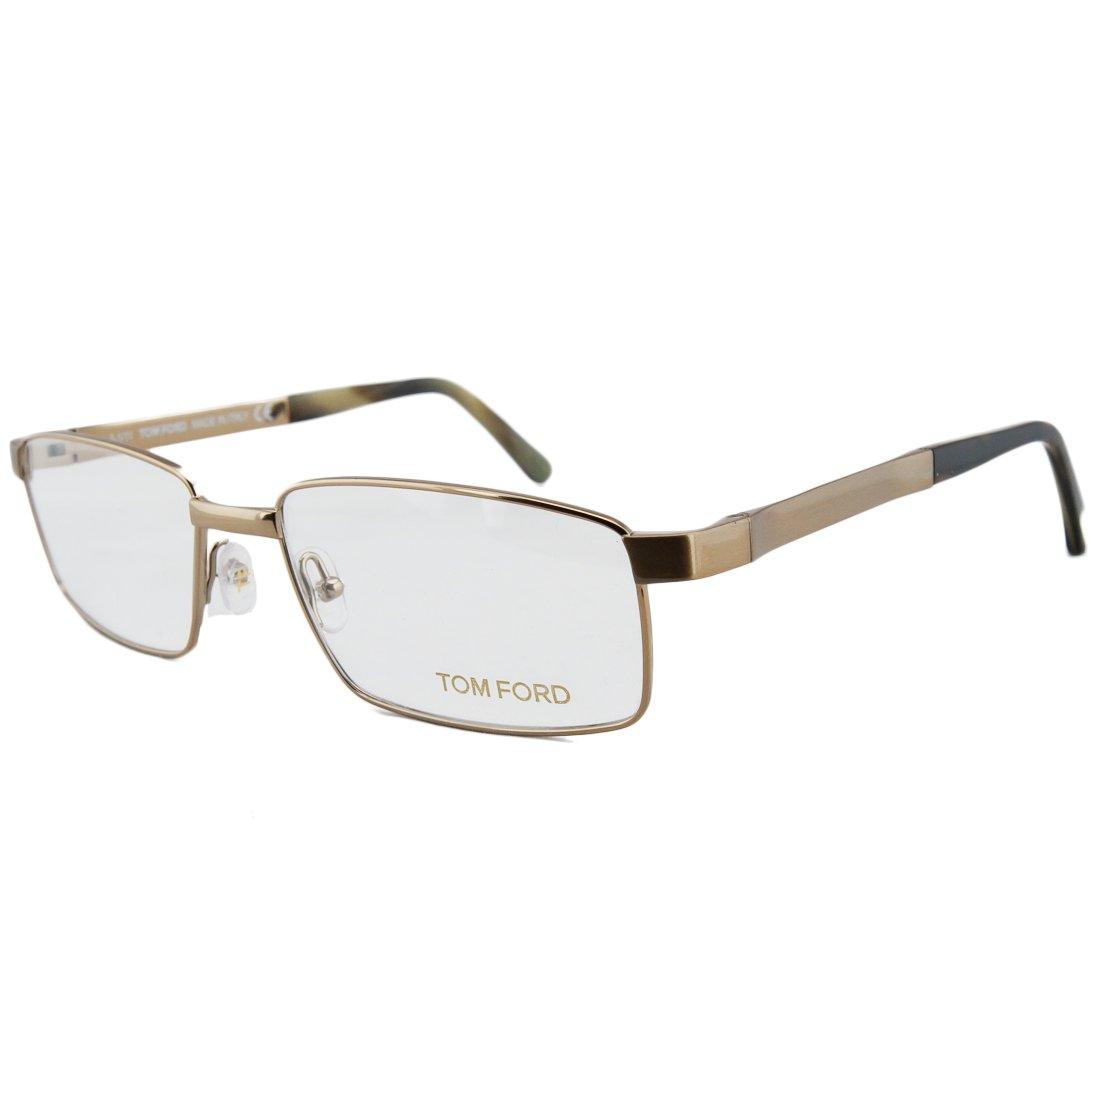 b30f6a8f47 Amazon.com  Tom Ford Glasses Frames 5205 028 Gold Havana  Clothing